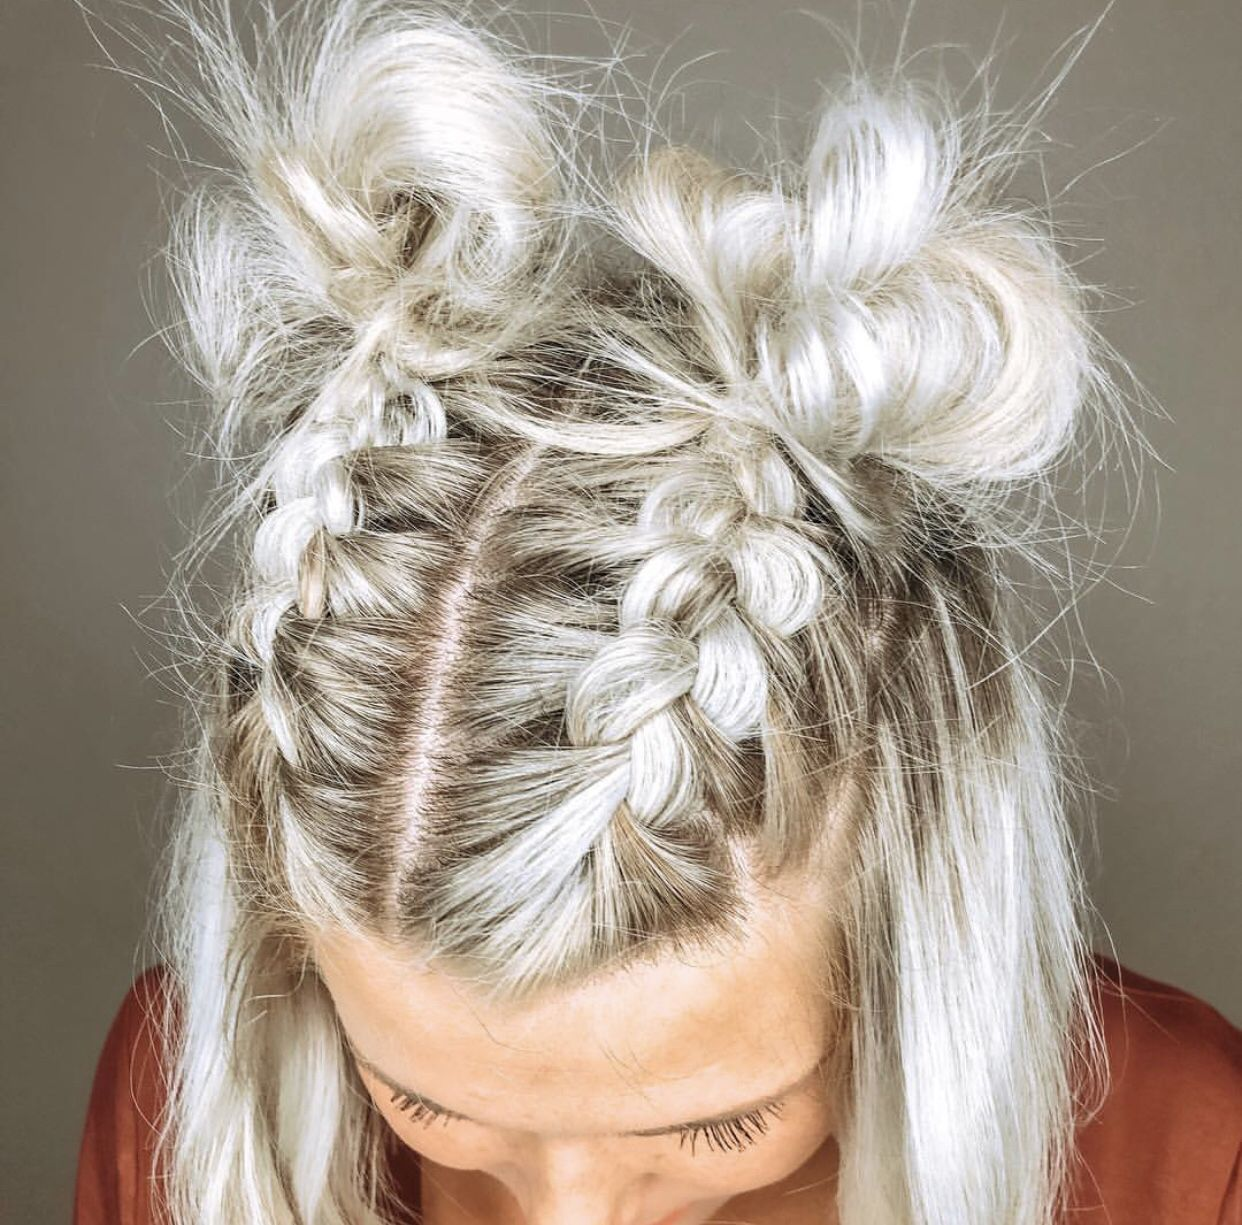 K A T I E Kathryynnicole Hairdos For Short Hair Short Hair Styles Easy Medium Hair Styles